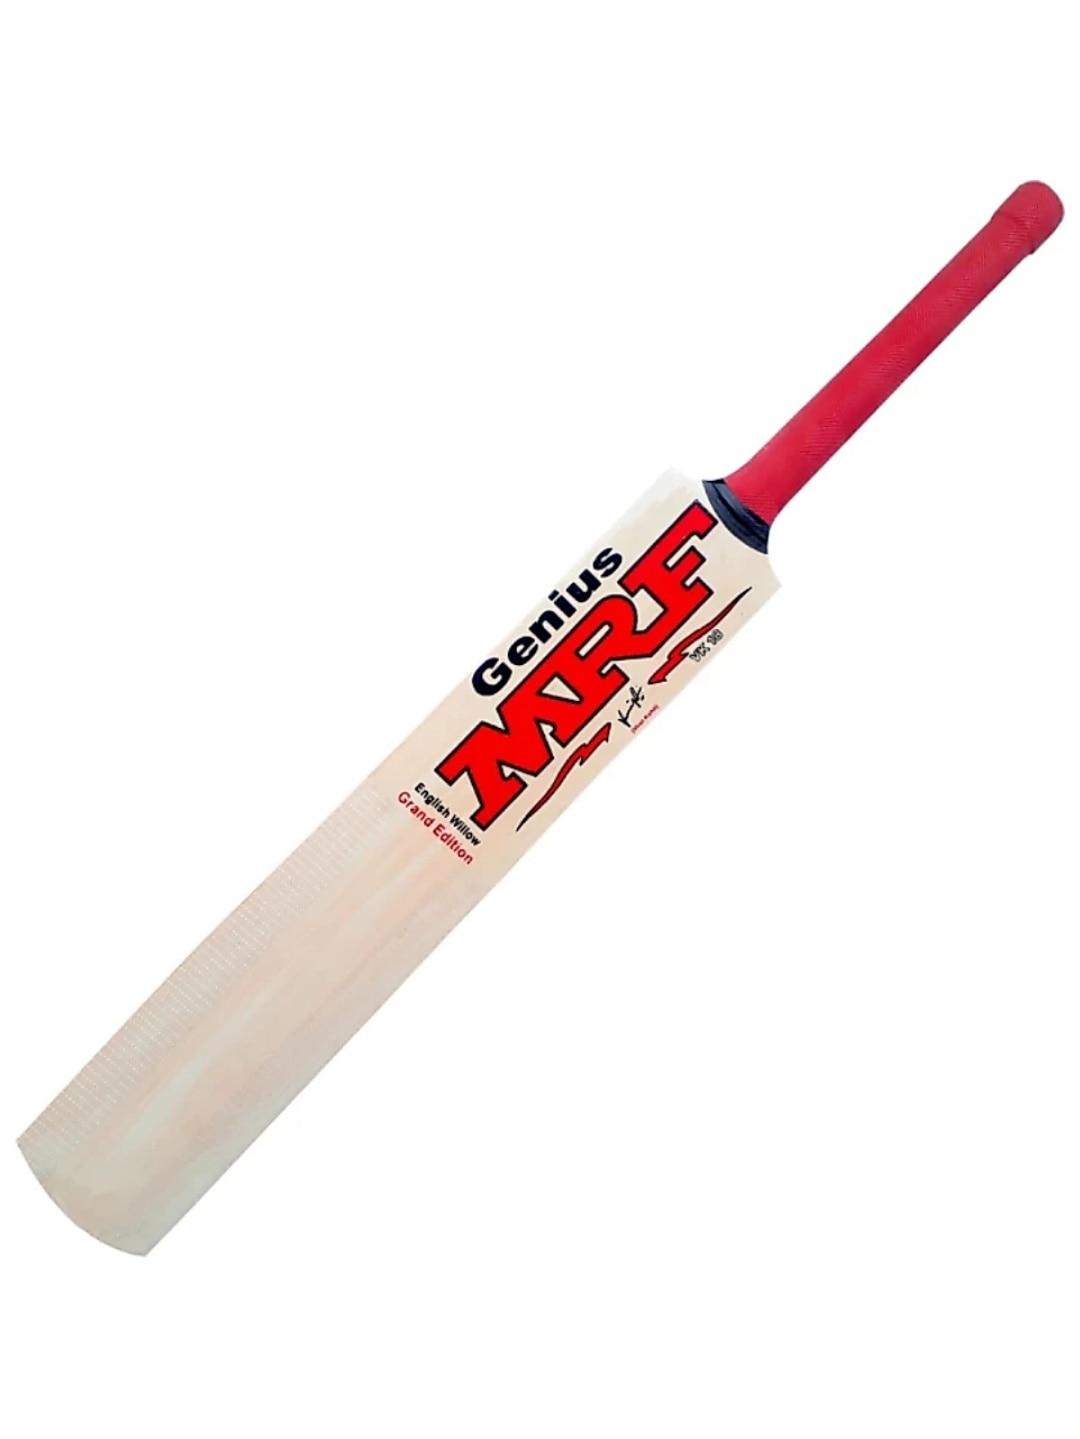 RK Enterprises MRF Transparent Sticker Poplar/Popular Willow Cricket Bat (For Tennis Ball) Size-6 (For Age Group 11-13 Yrs)